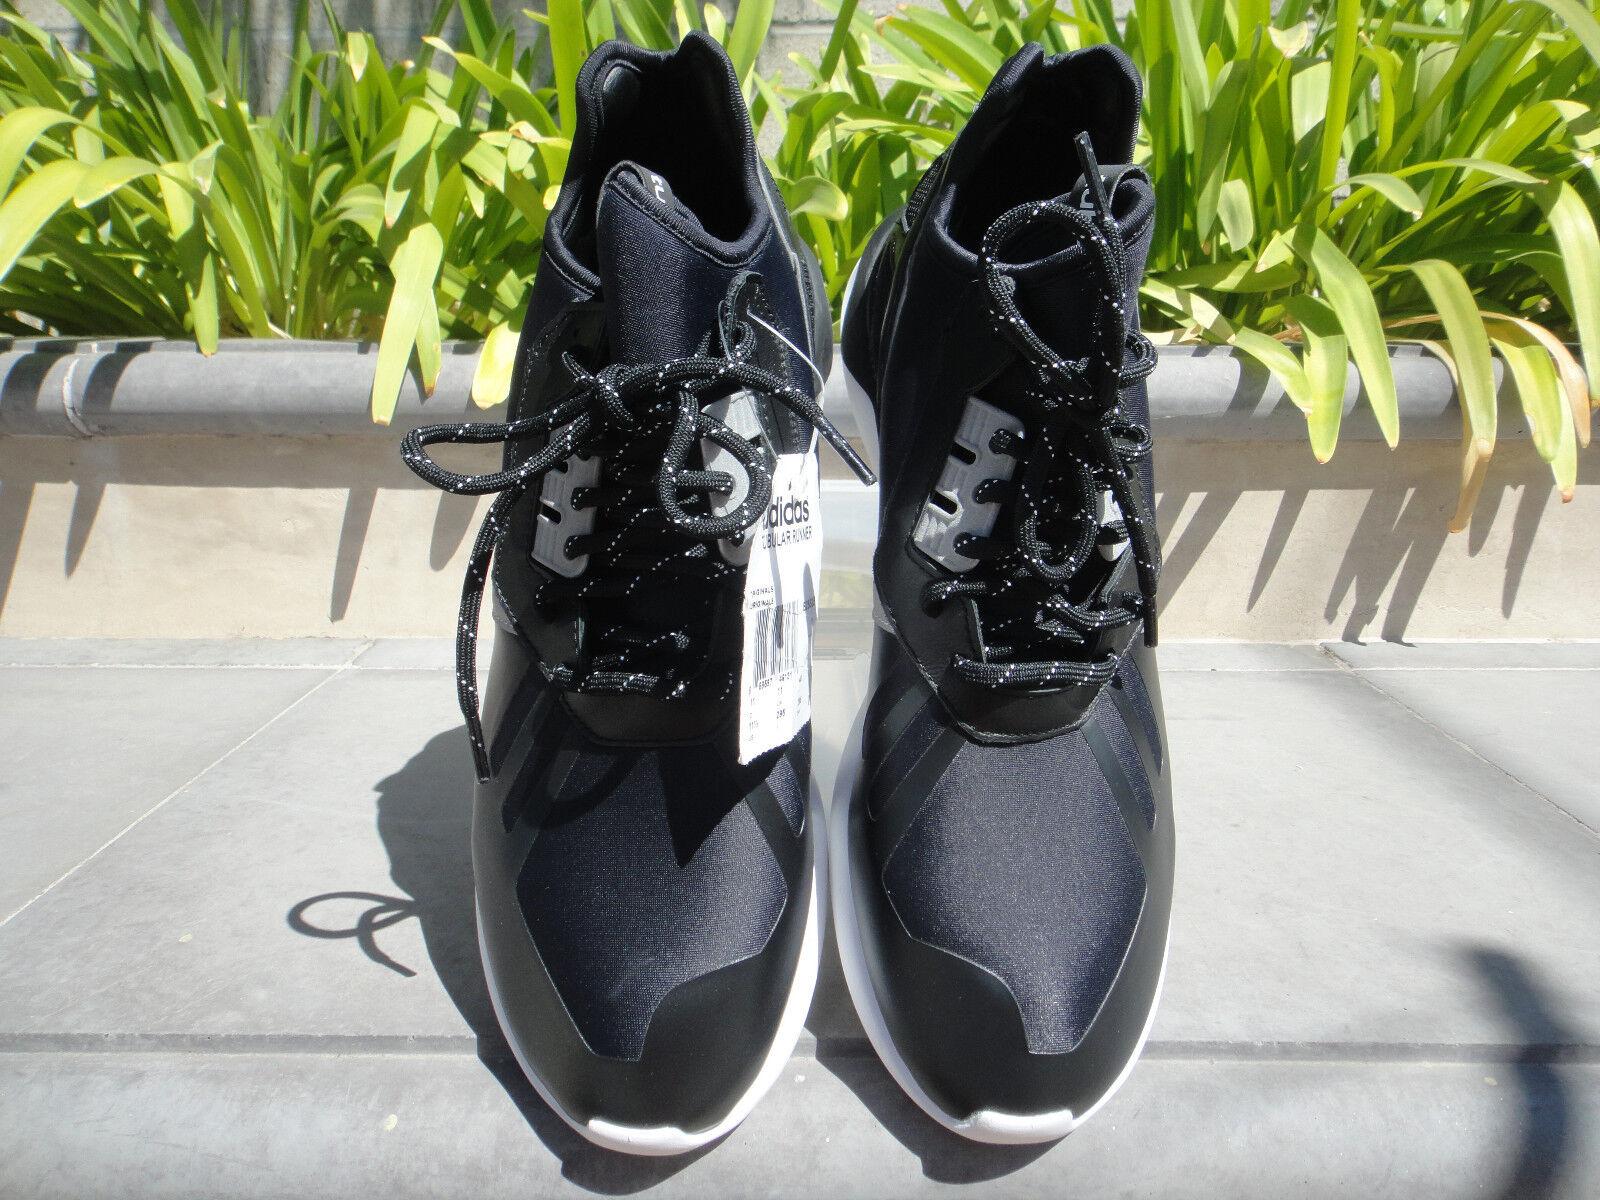 SALE  adidas Tubular Runner BLACK GREY WHITE Leather Textile B25525 Men's US11.5